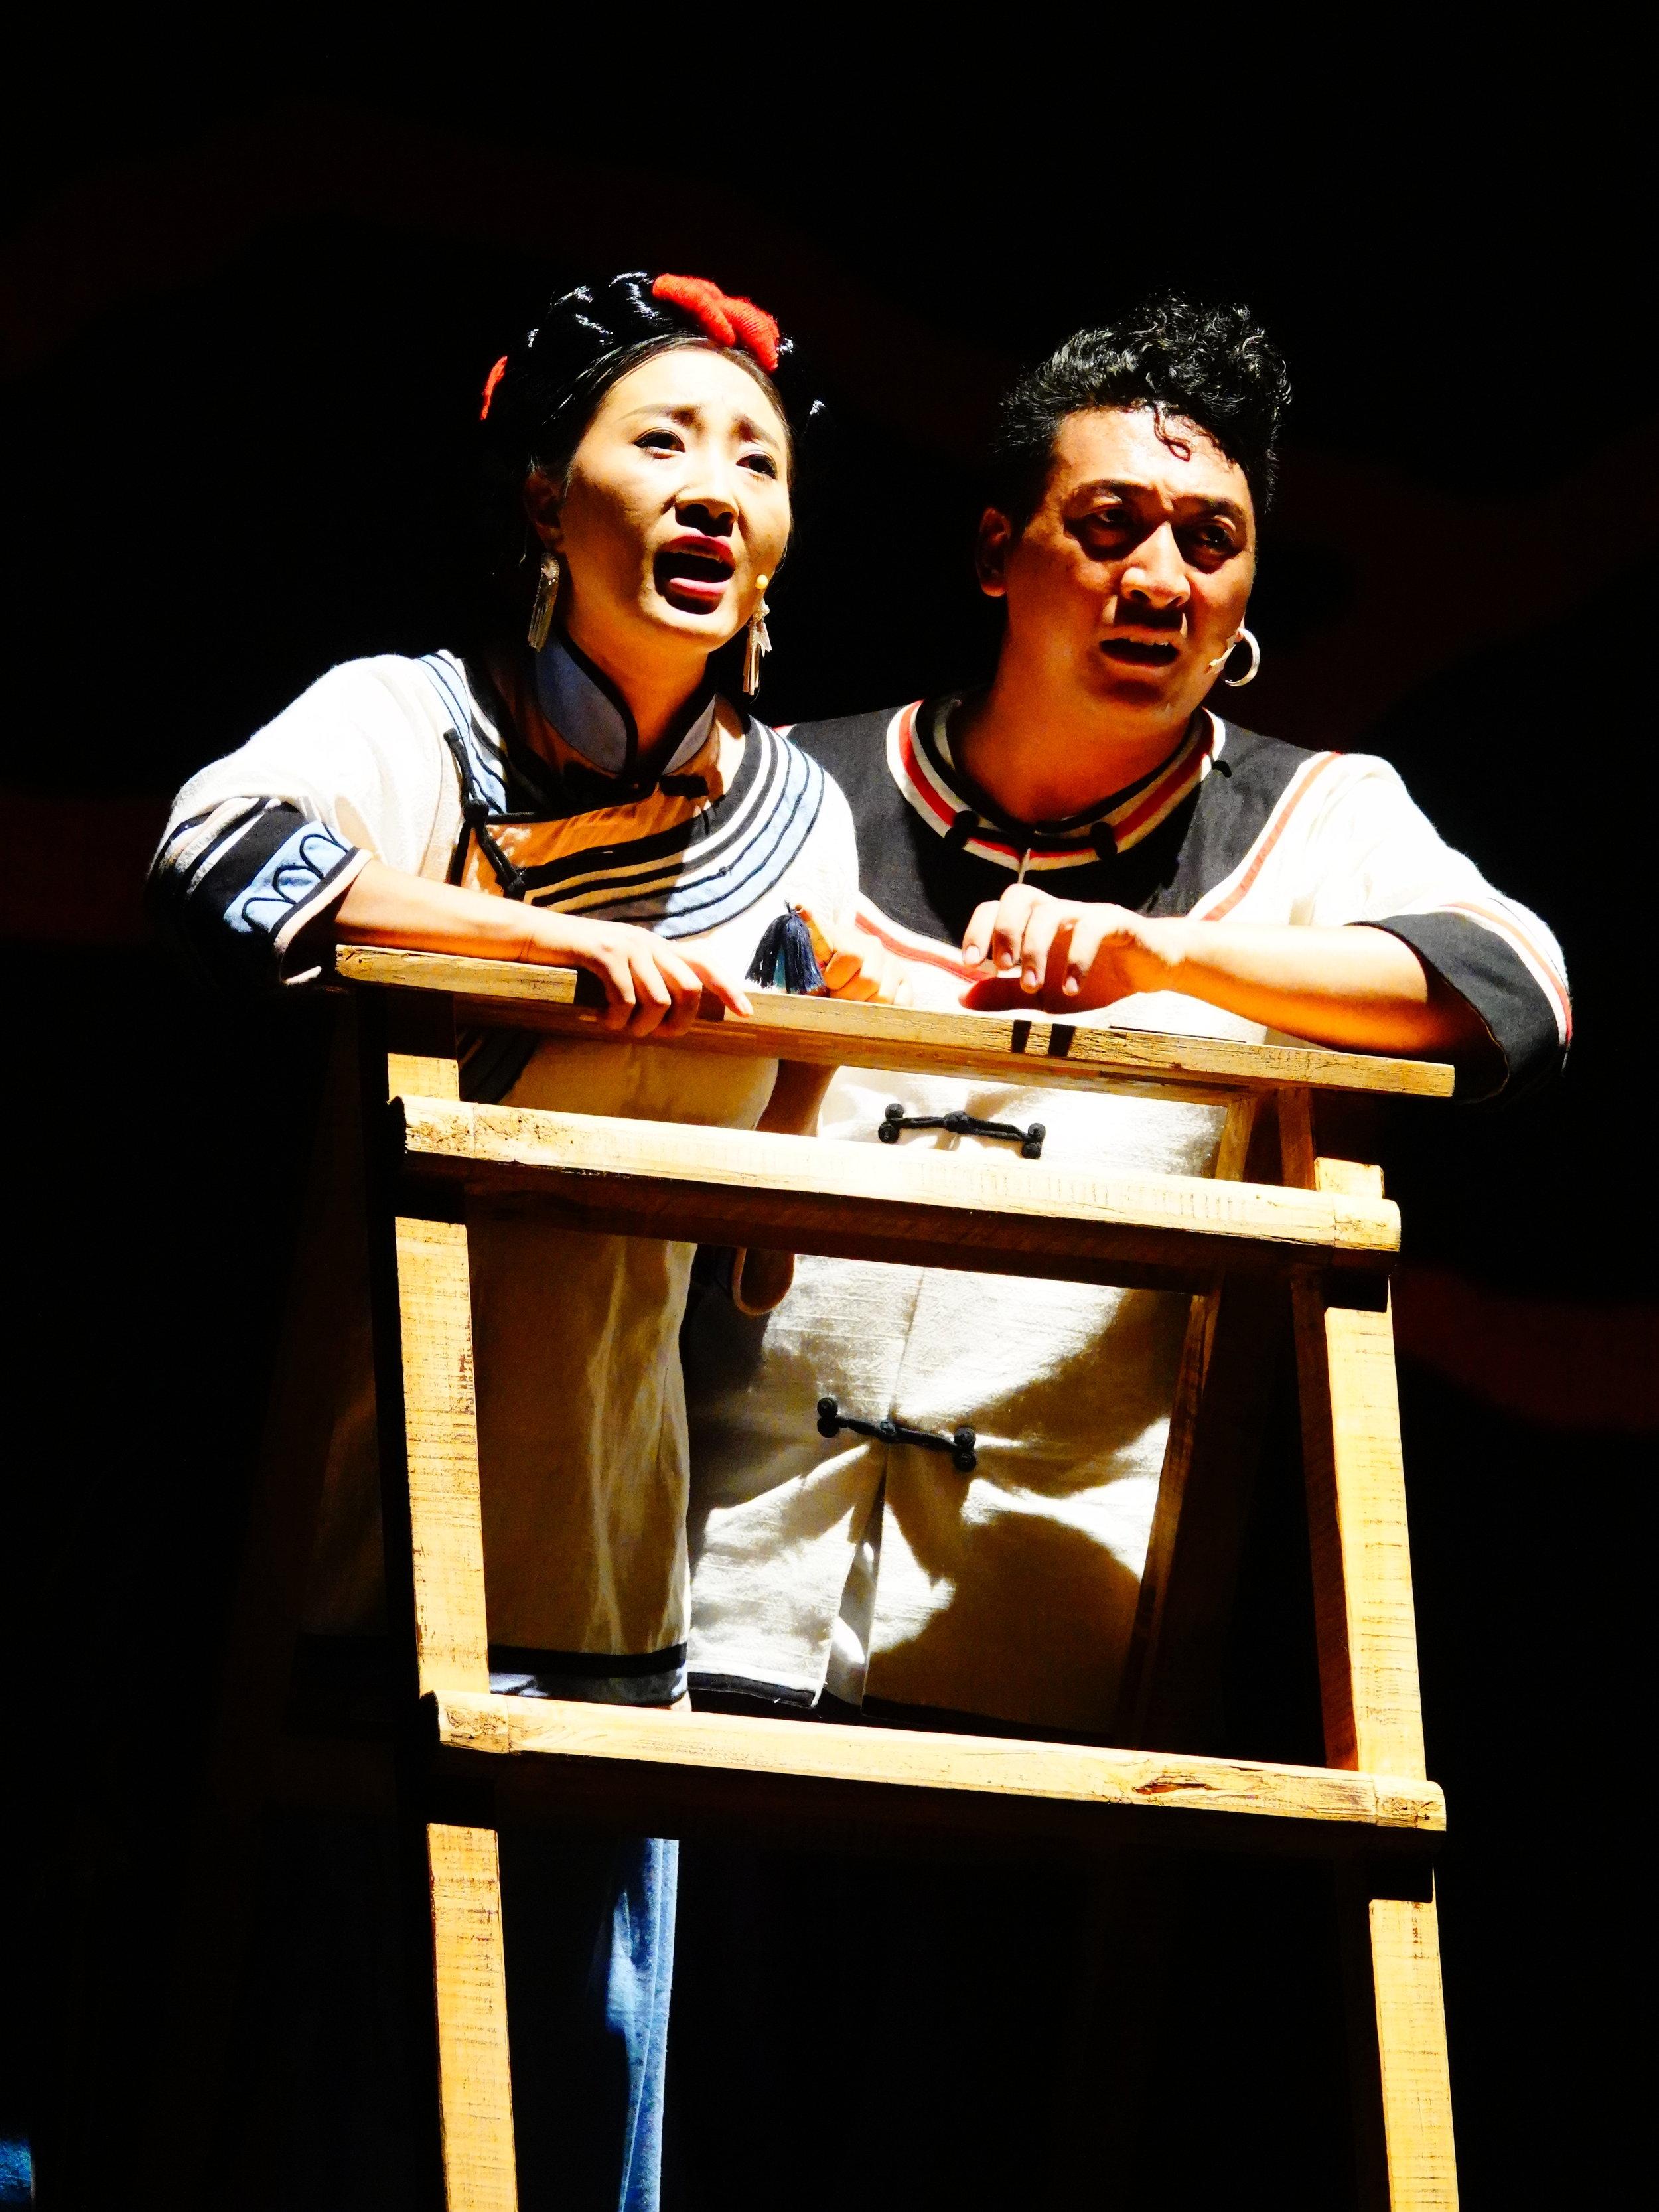 Left to right: Afu Shuoguo and Hairi Wuzhi.